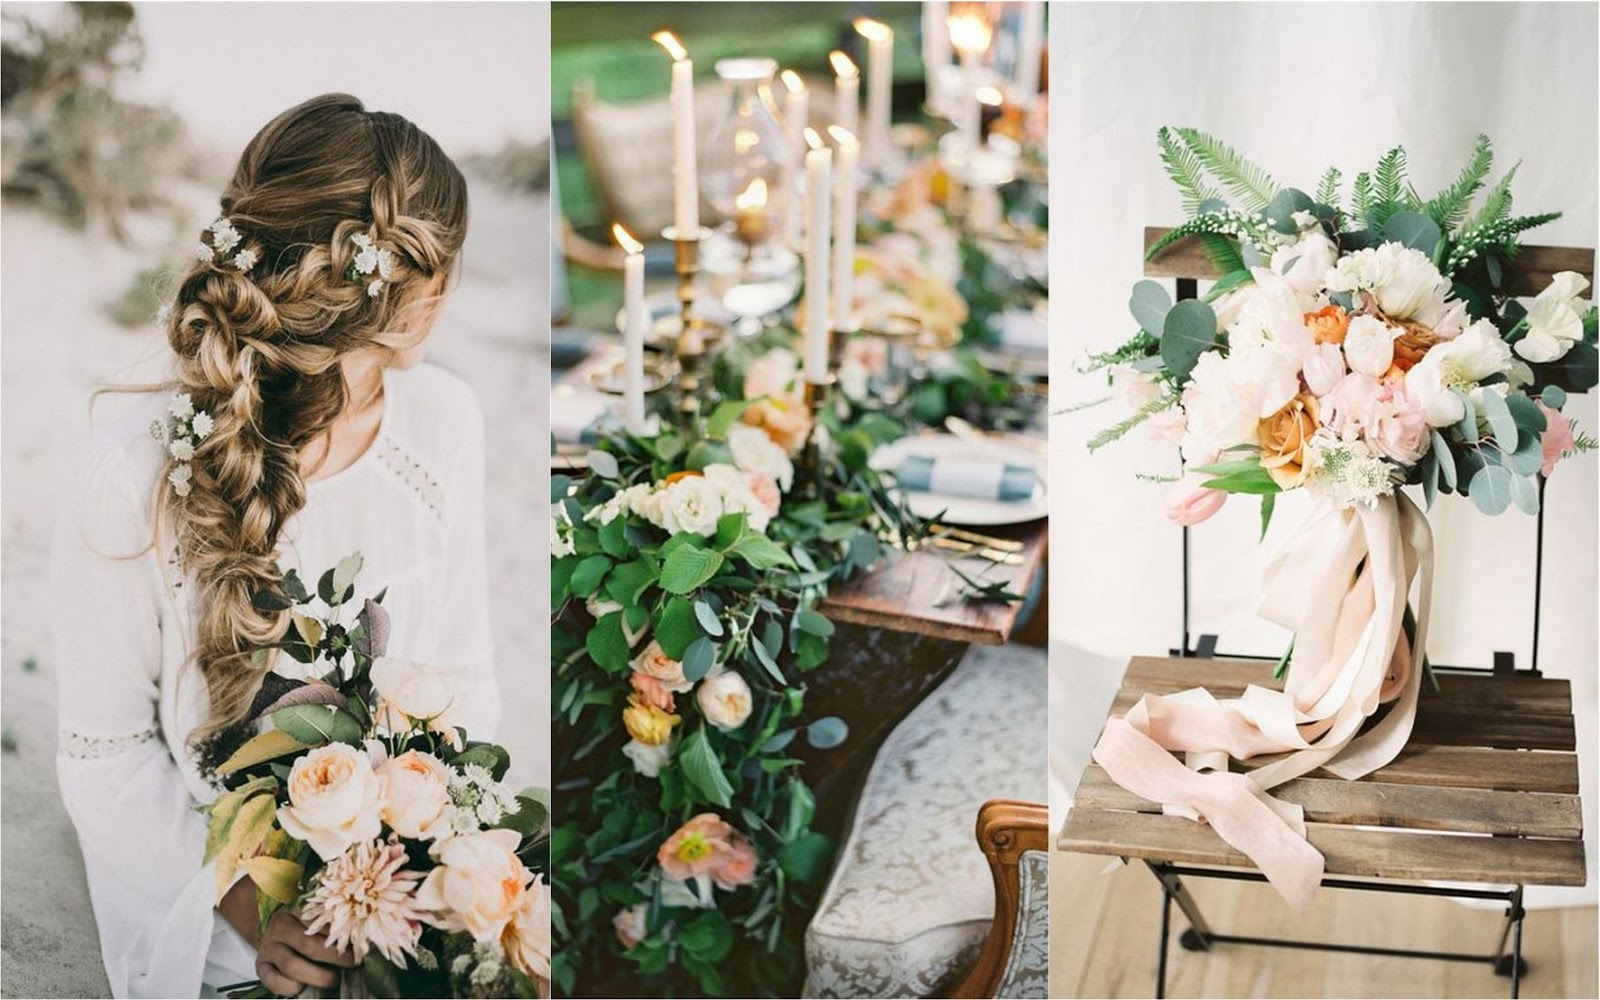 Kolor na Ślub i Wesele, Kolory ślubne 2017, Kolory ślubów i wesel 2017, Modne kolory 2017, Ślub i Wesele w Kolorze, Trendy Ślubne 2017